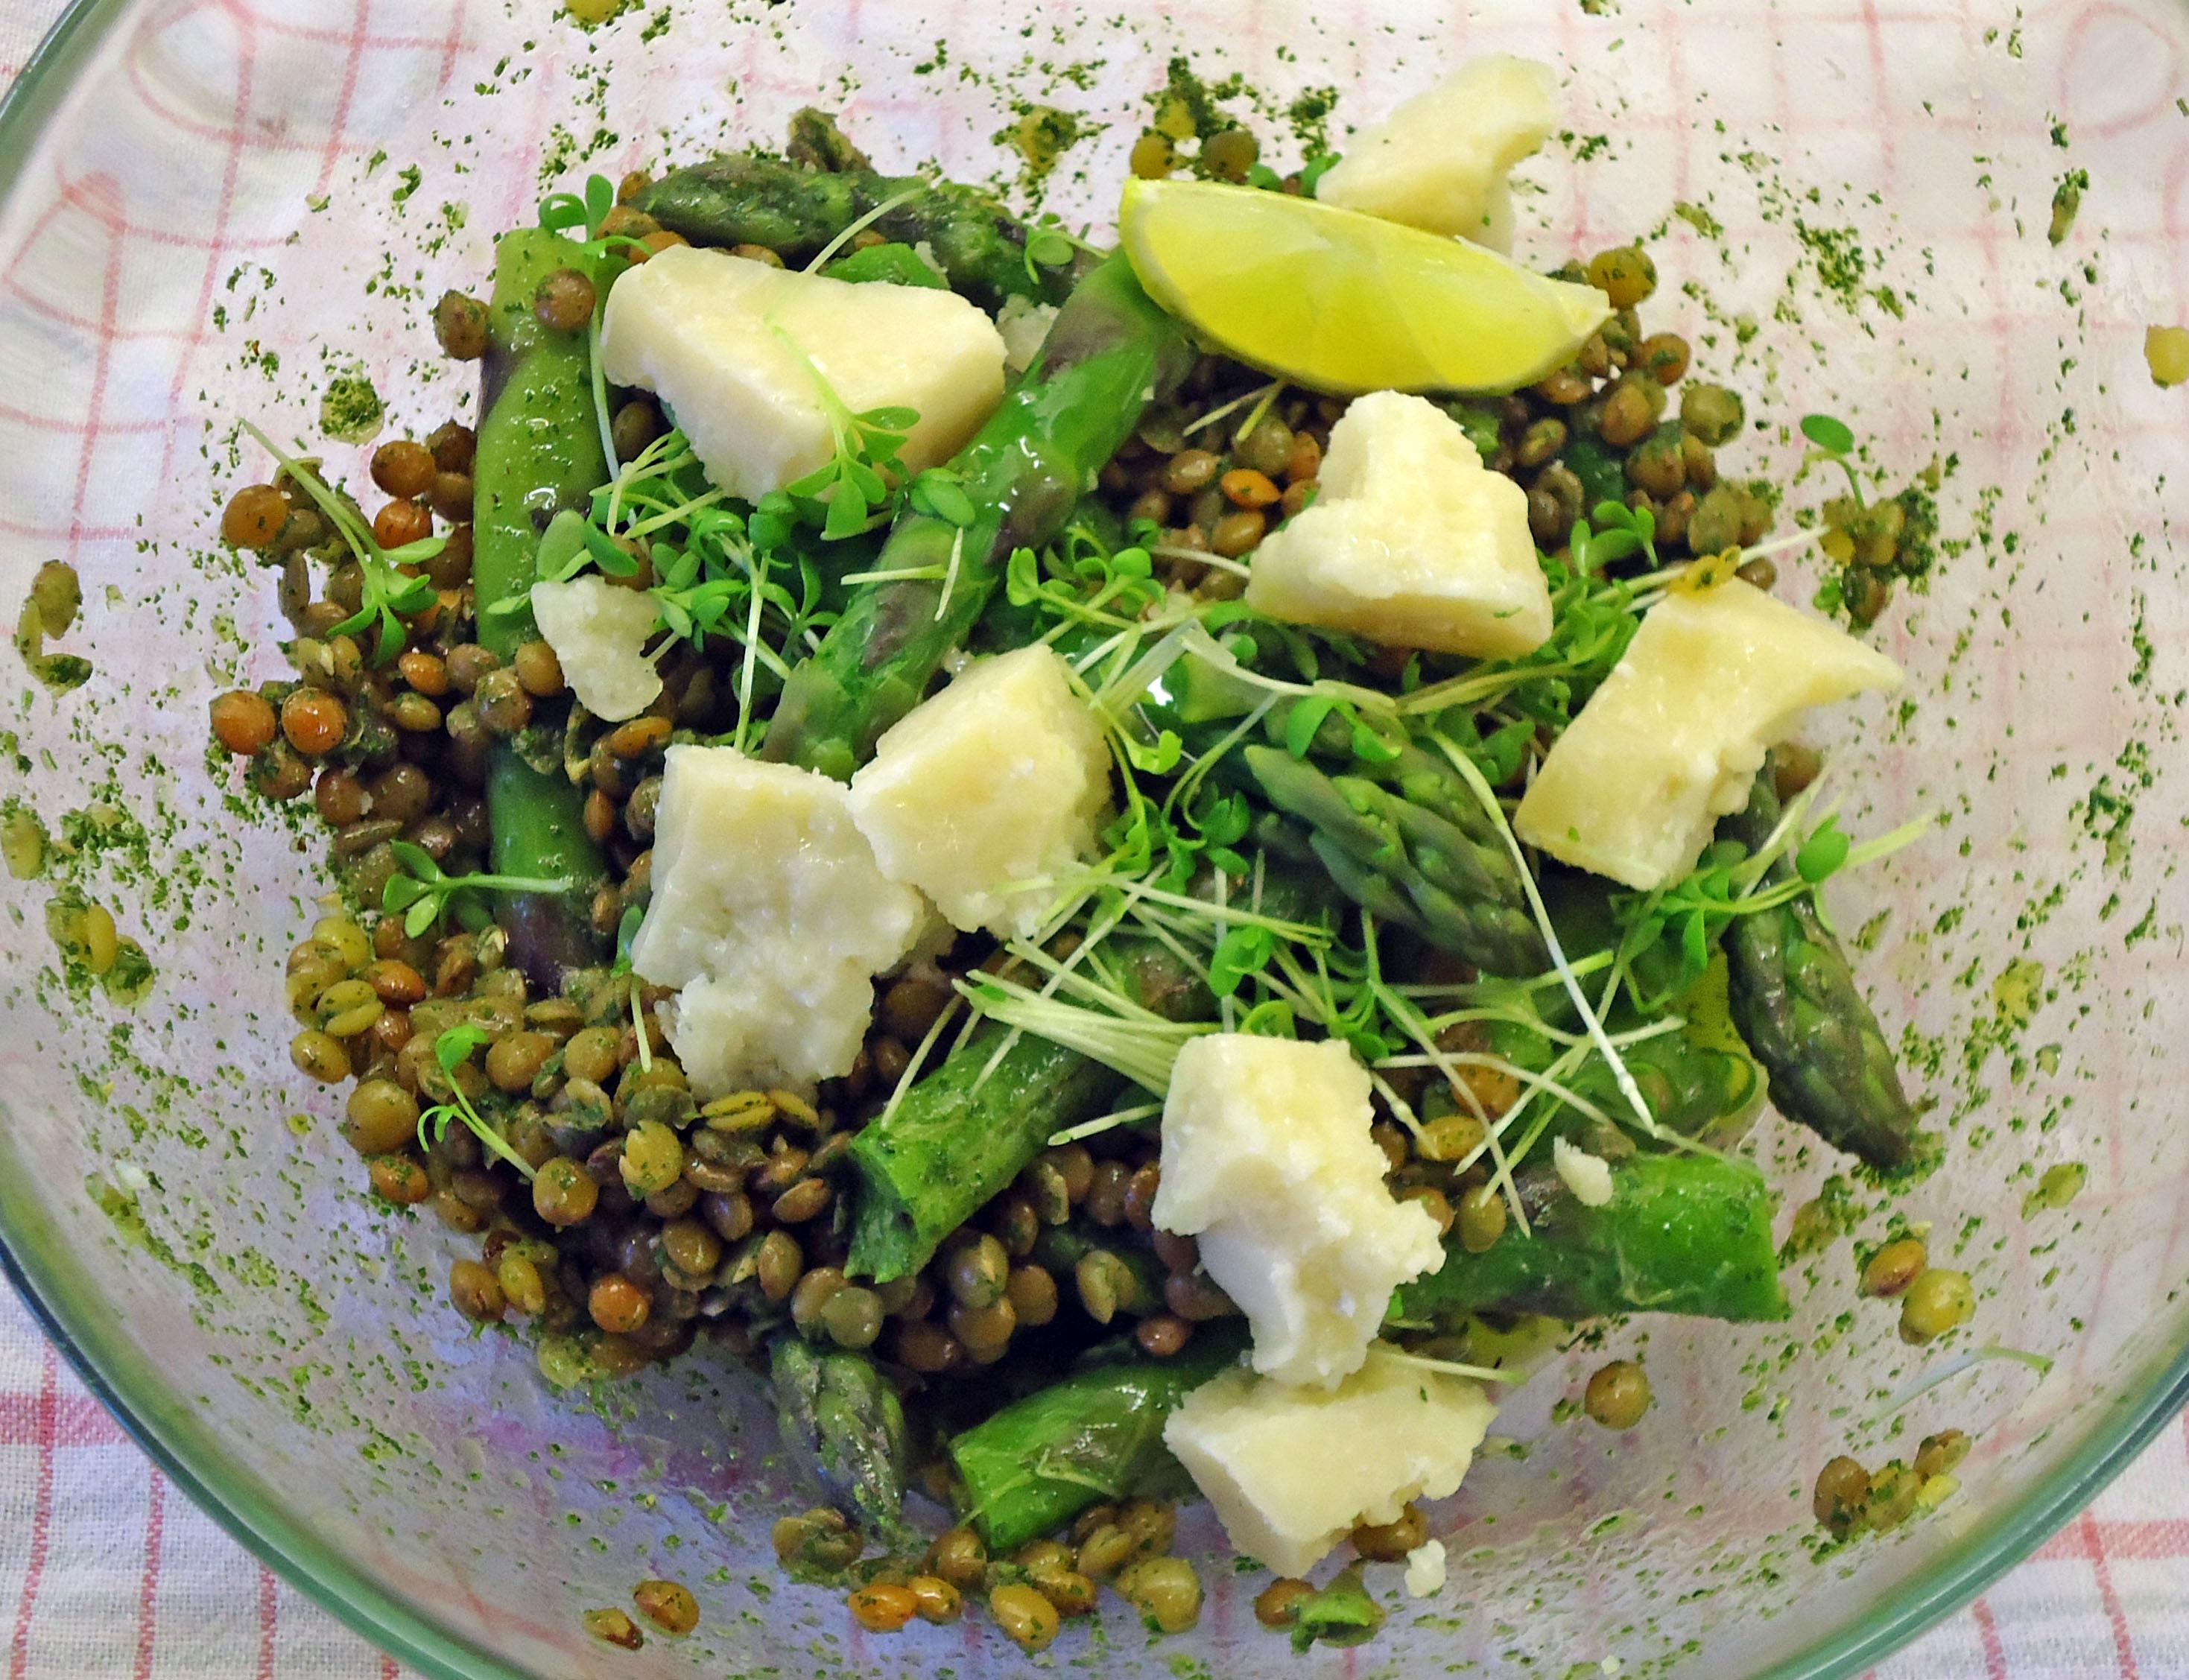 Salat gruner spargel linsen